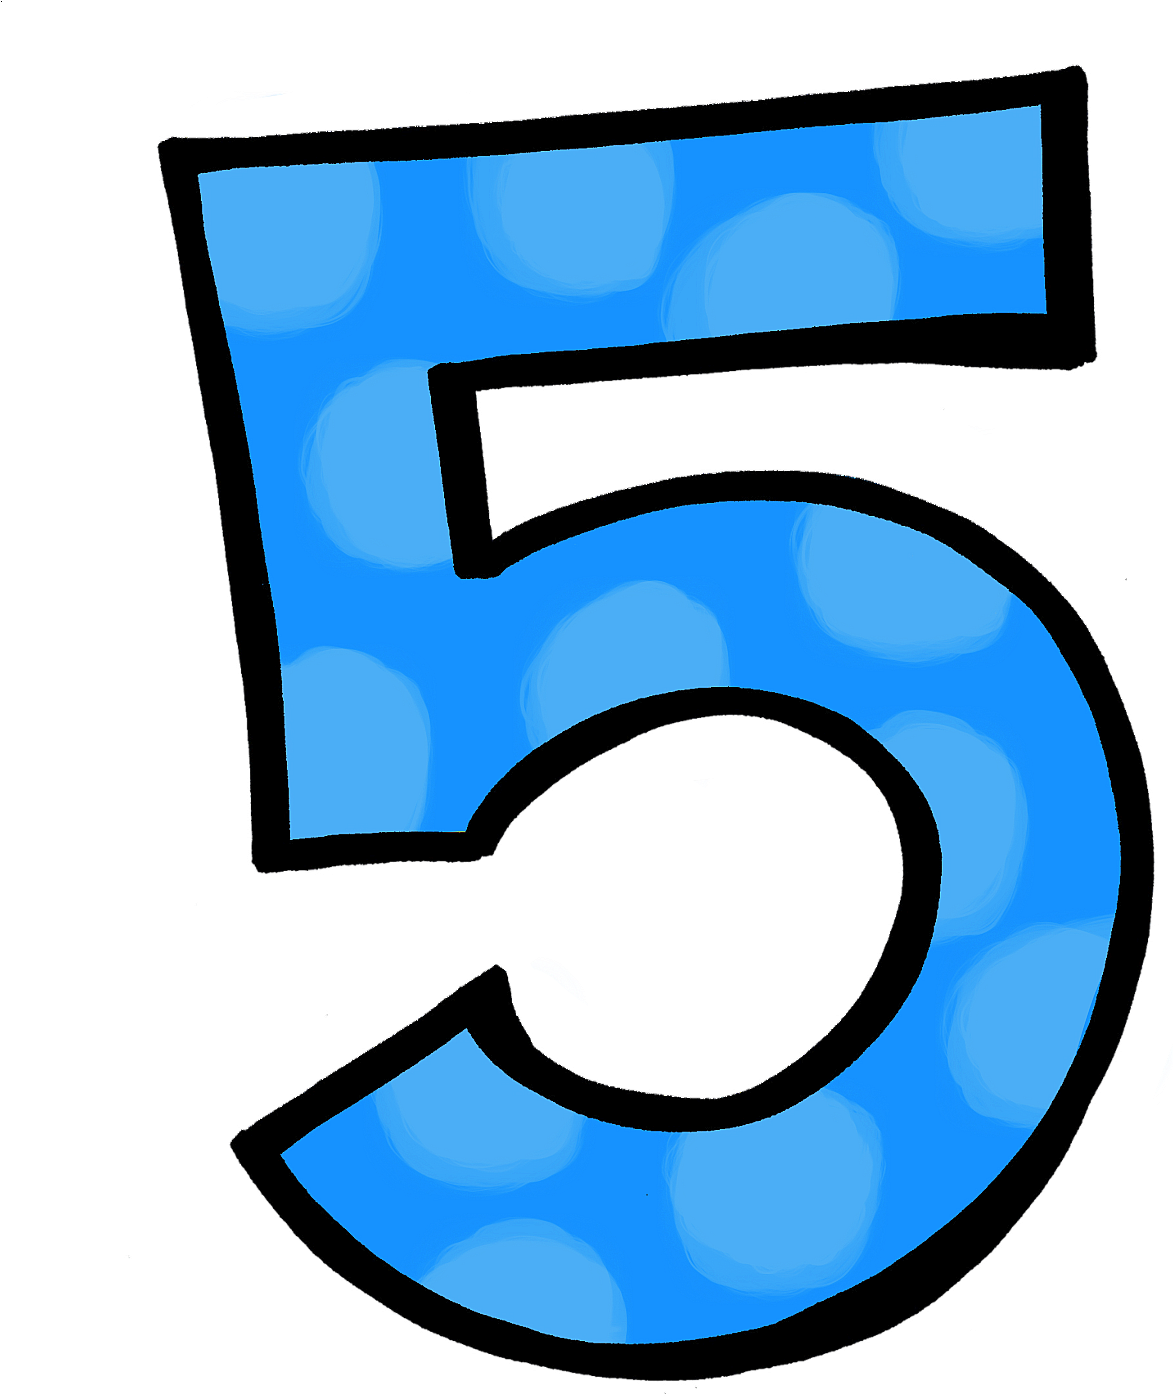 Transparent polka dots clipart - Polka Dot Number 3 Polka Dot Numbers Polka